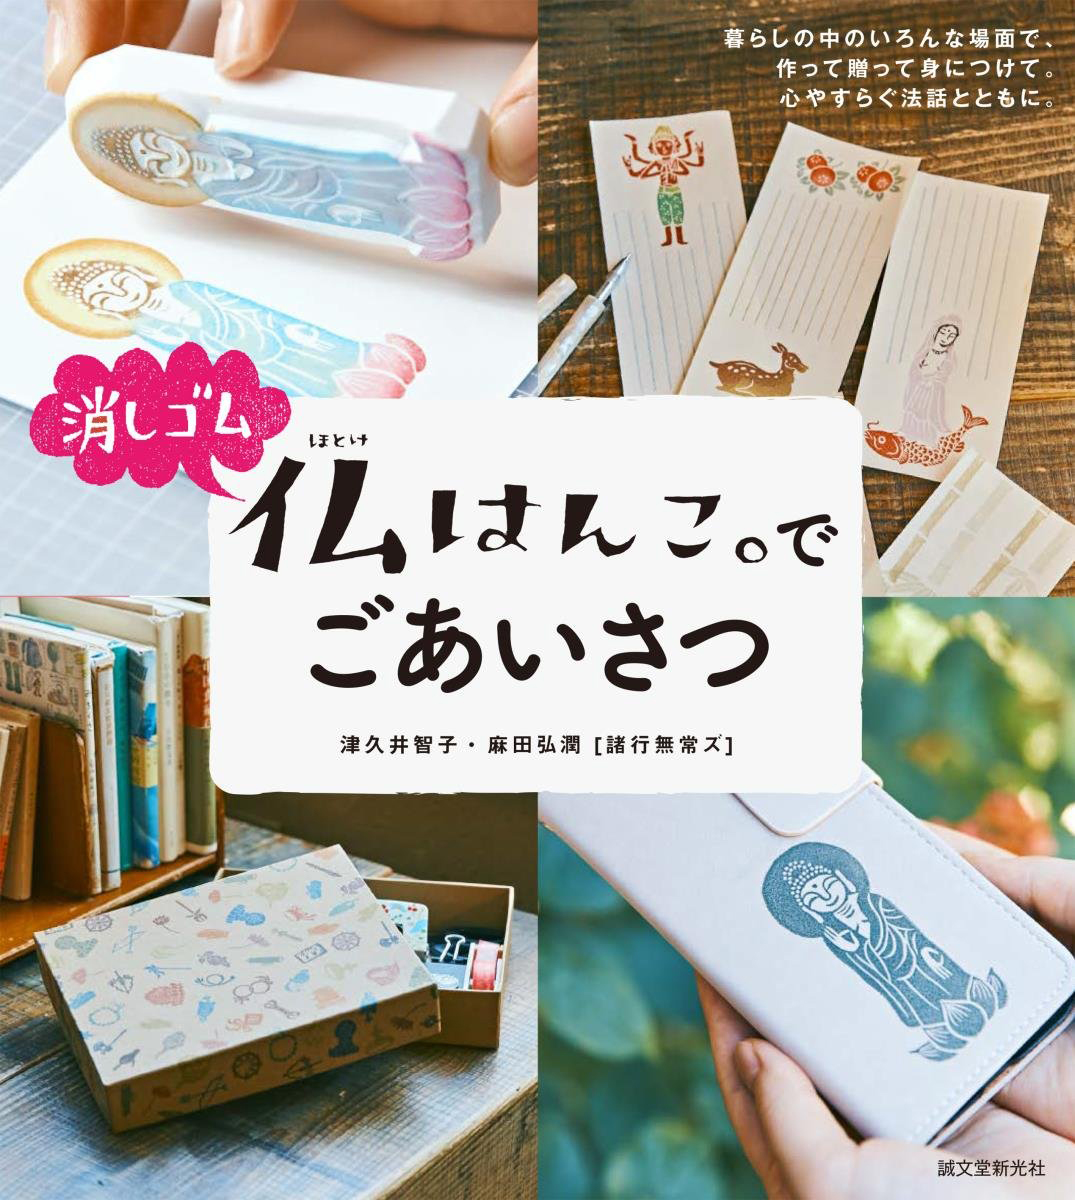 keshigomuhanko_cover01